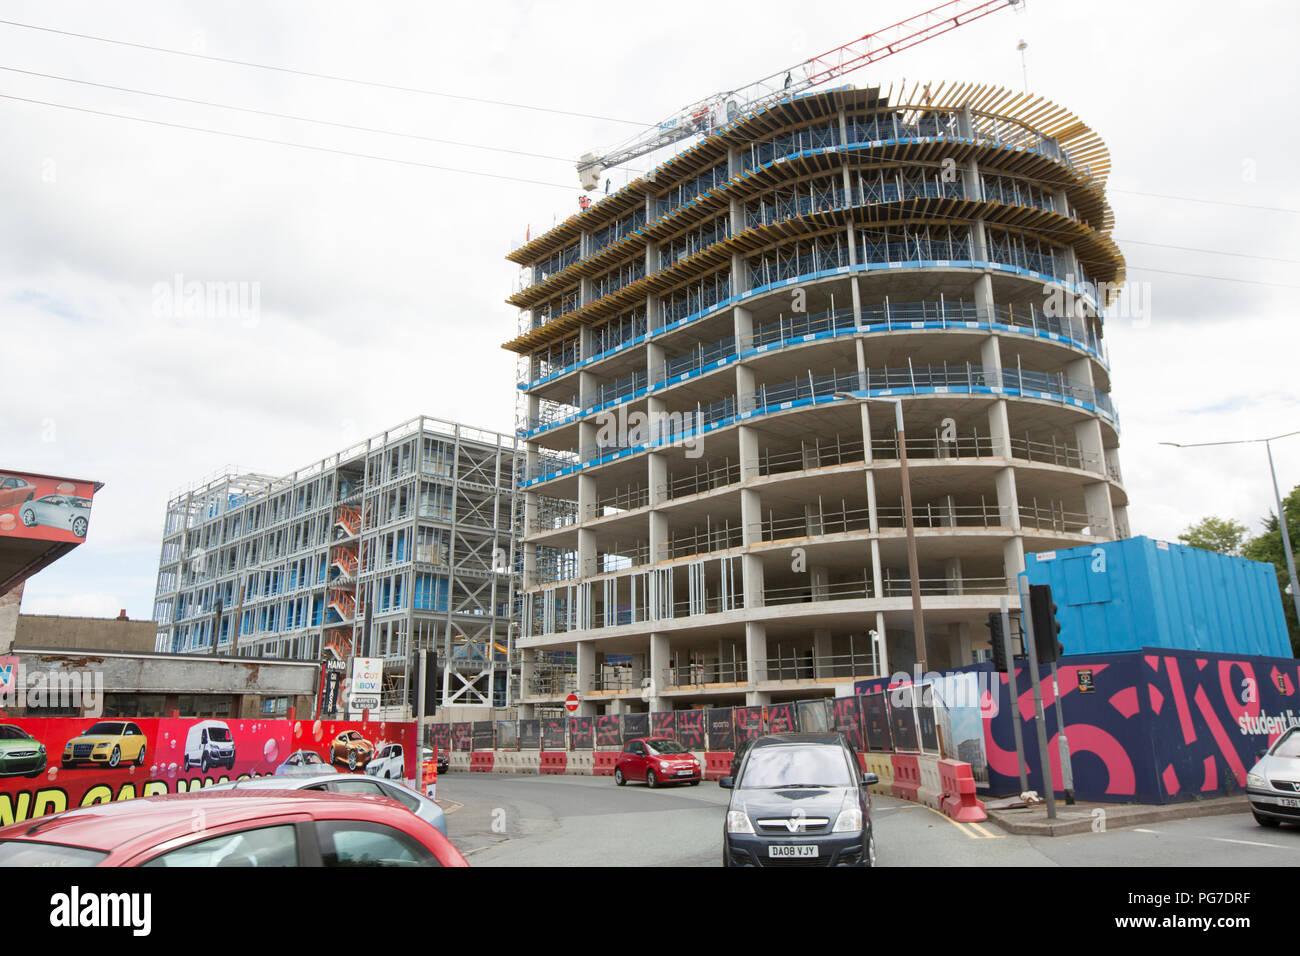 Caton Court student accomodation being built in Lancaster Lancashire England UK GB - Stock Image